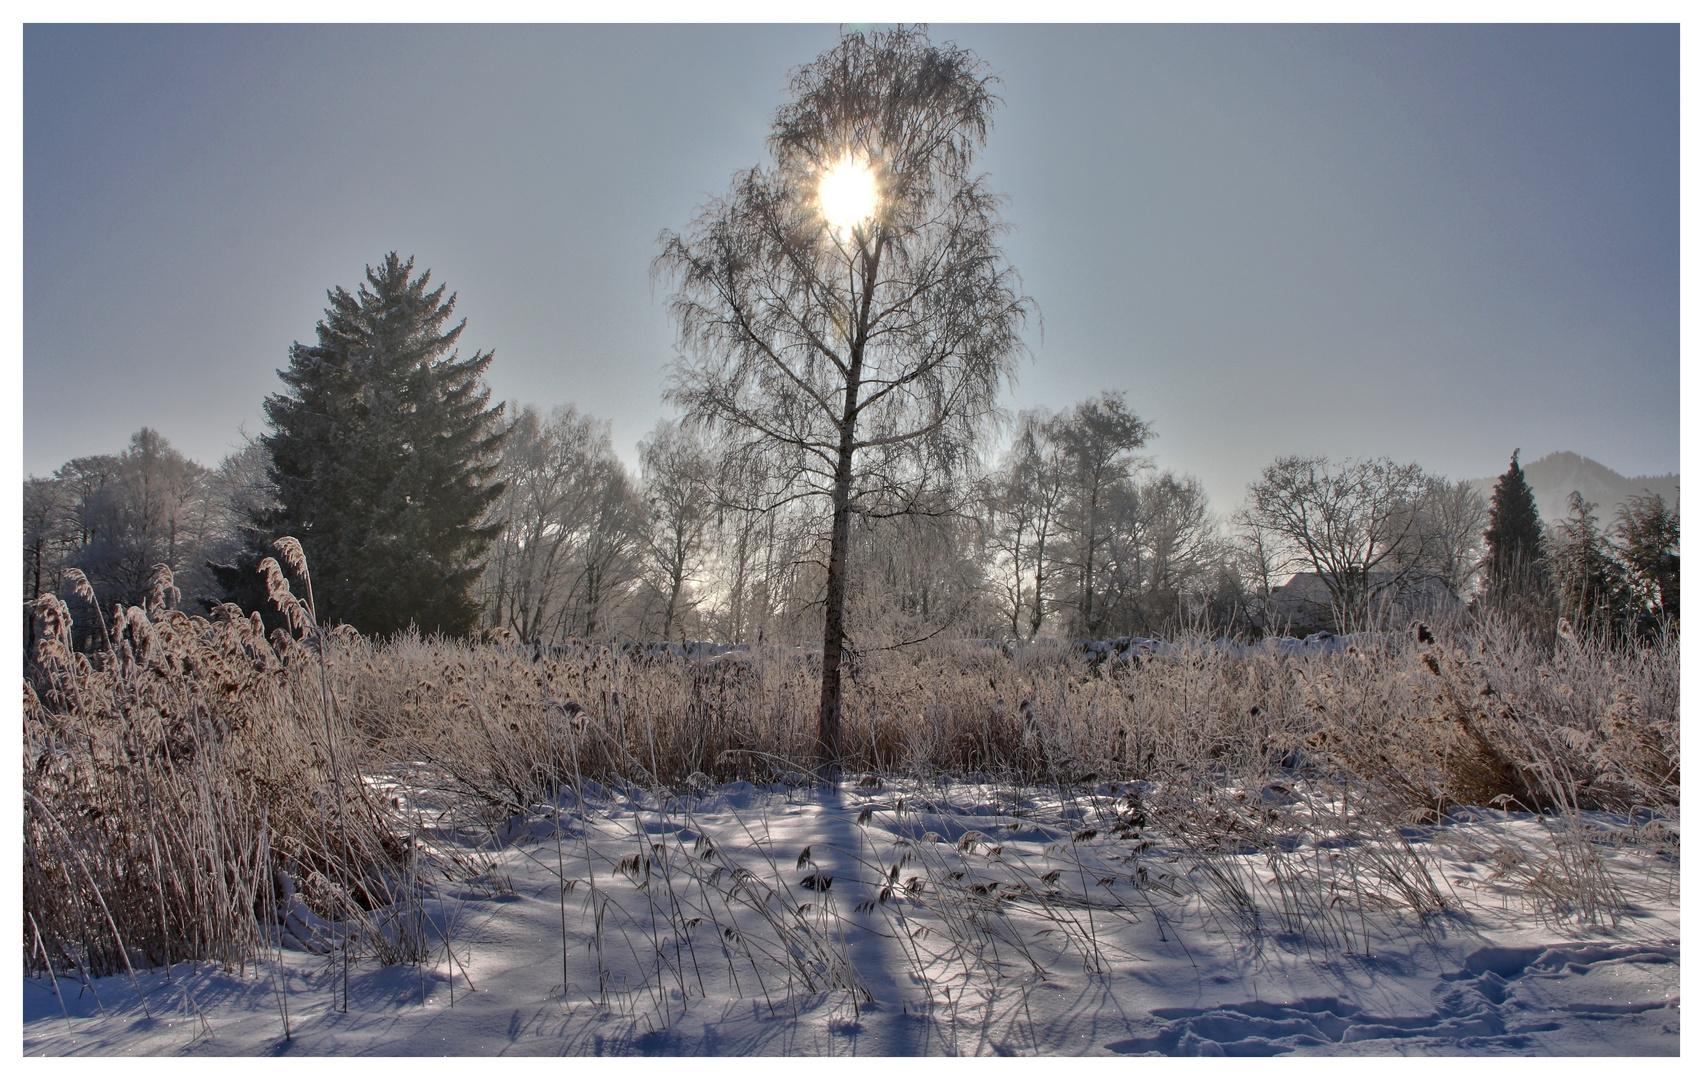 Winter am tegernsee